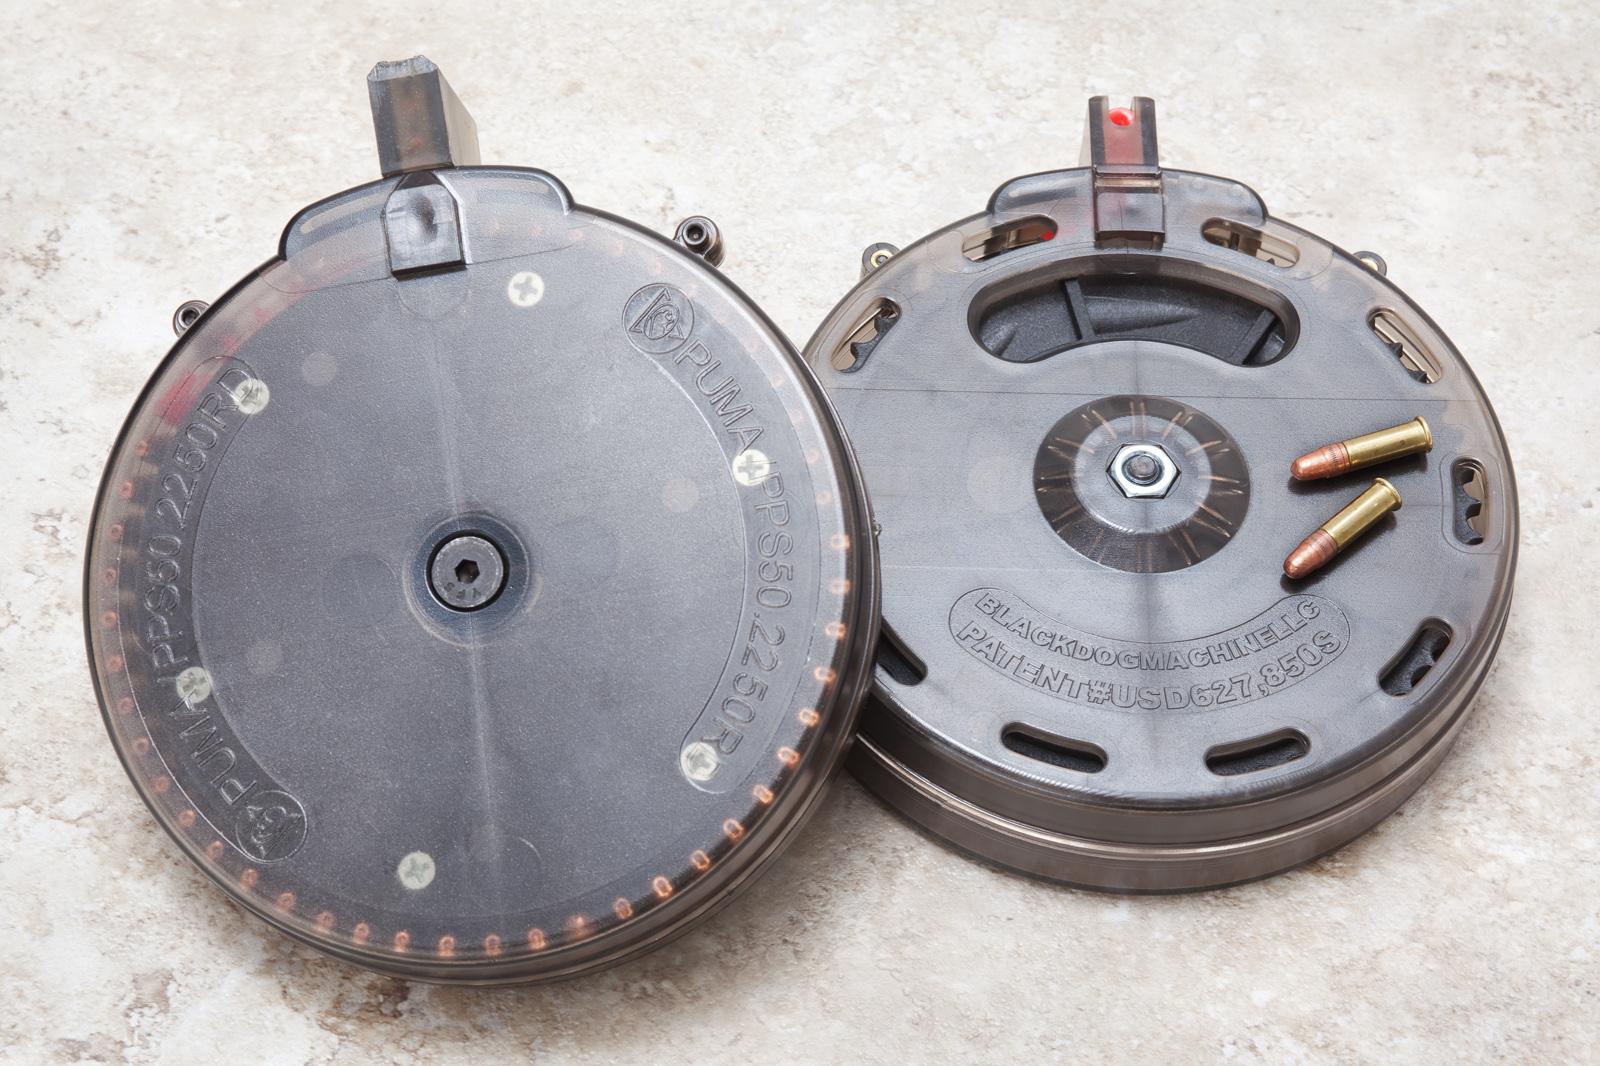 Puma PPS50 drum byBlack Dog Machine keeps each cartirdge separate and not under pressure.